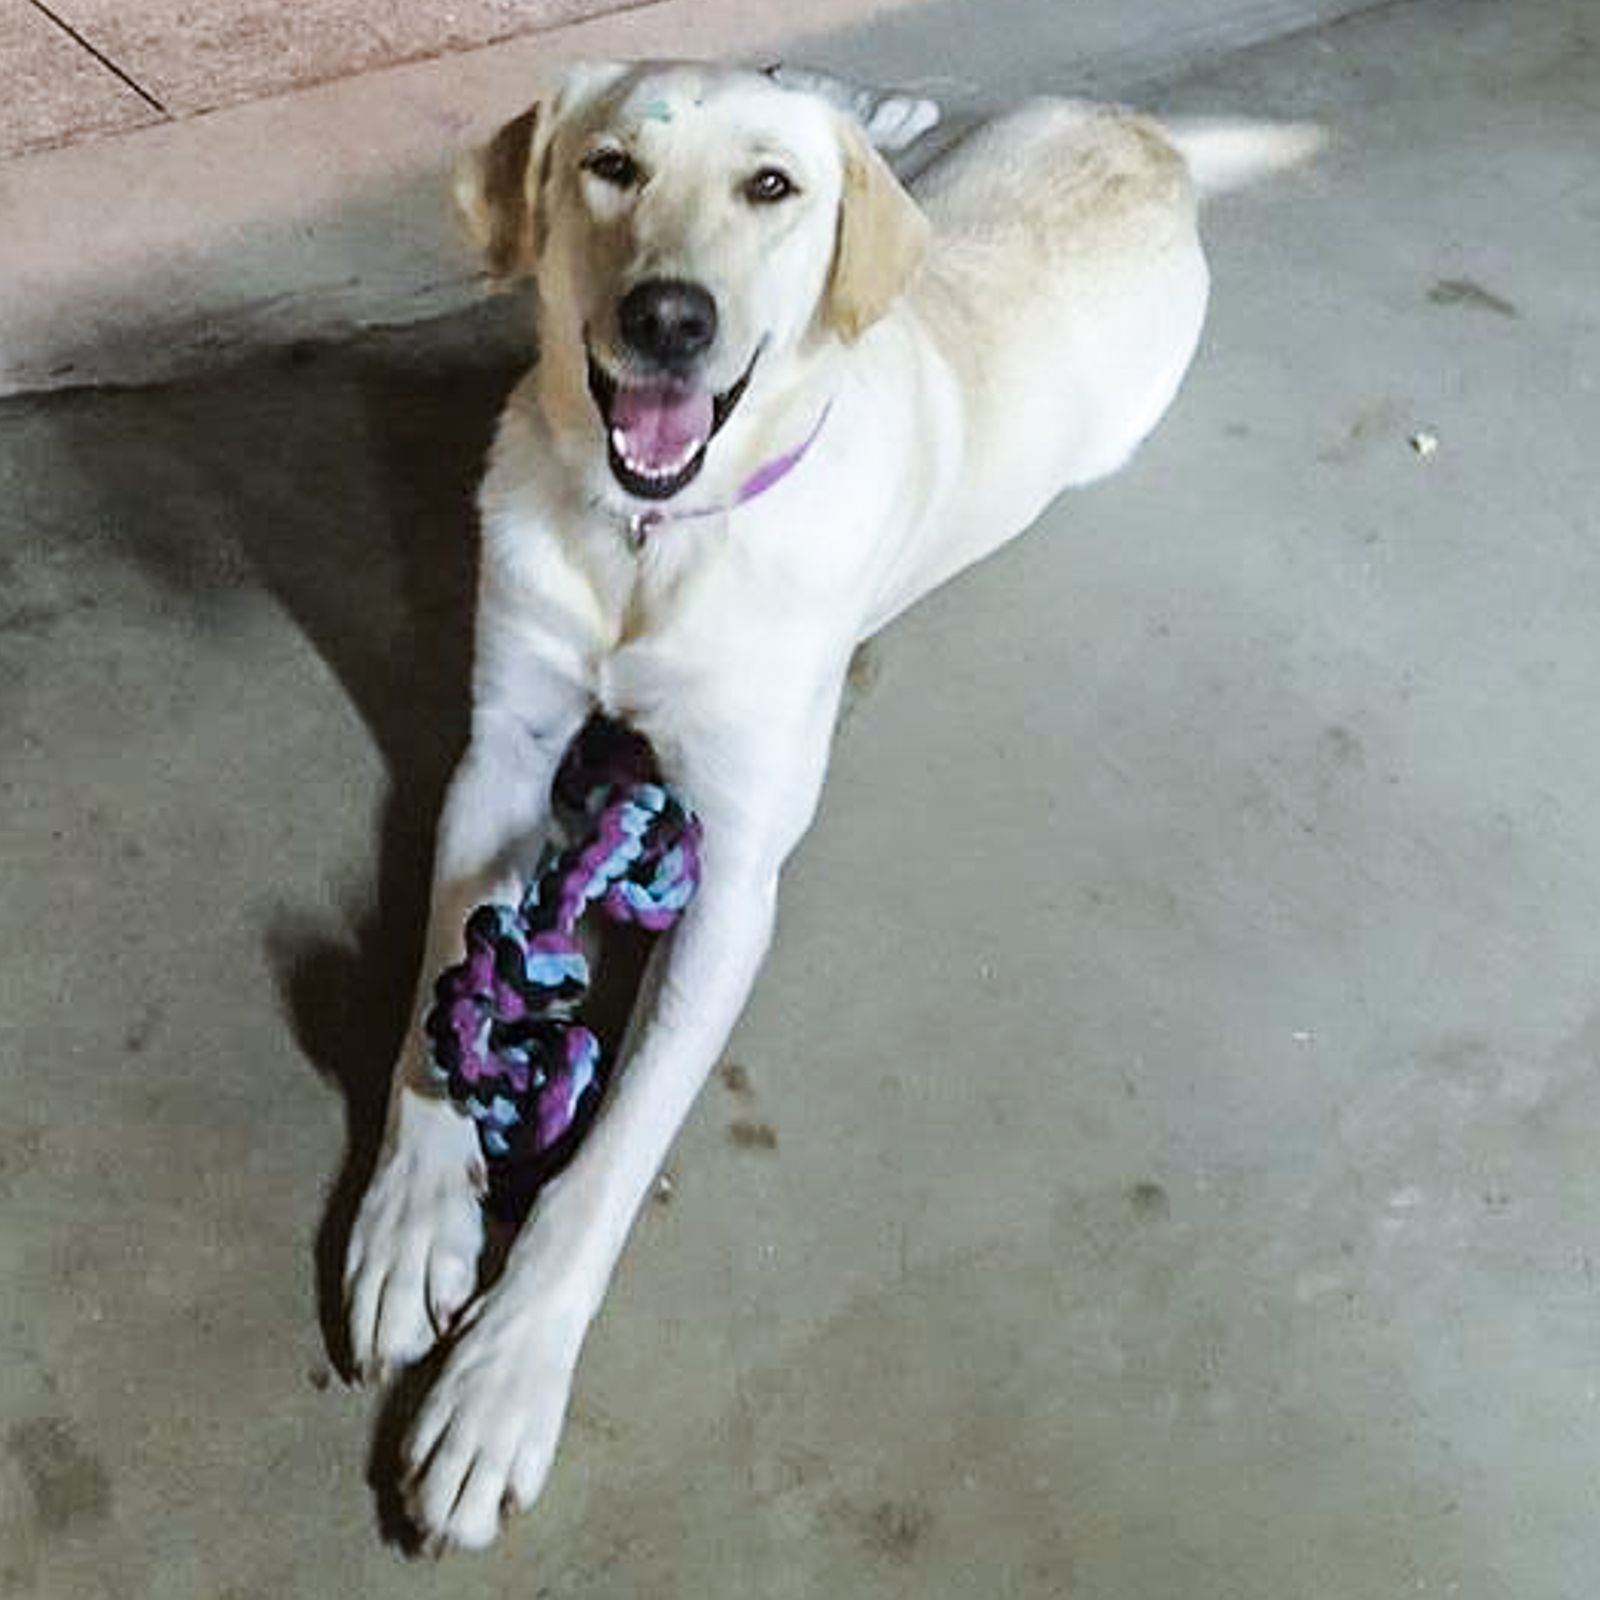 Lost Dog Female Saint Clairsville, OH, USA 43950